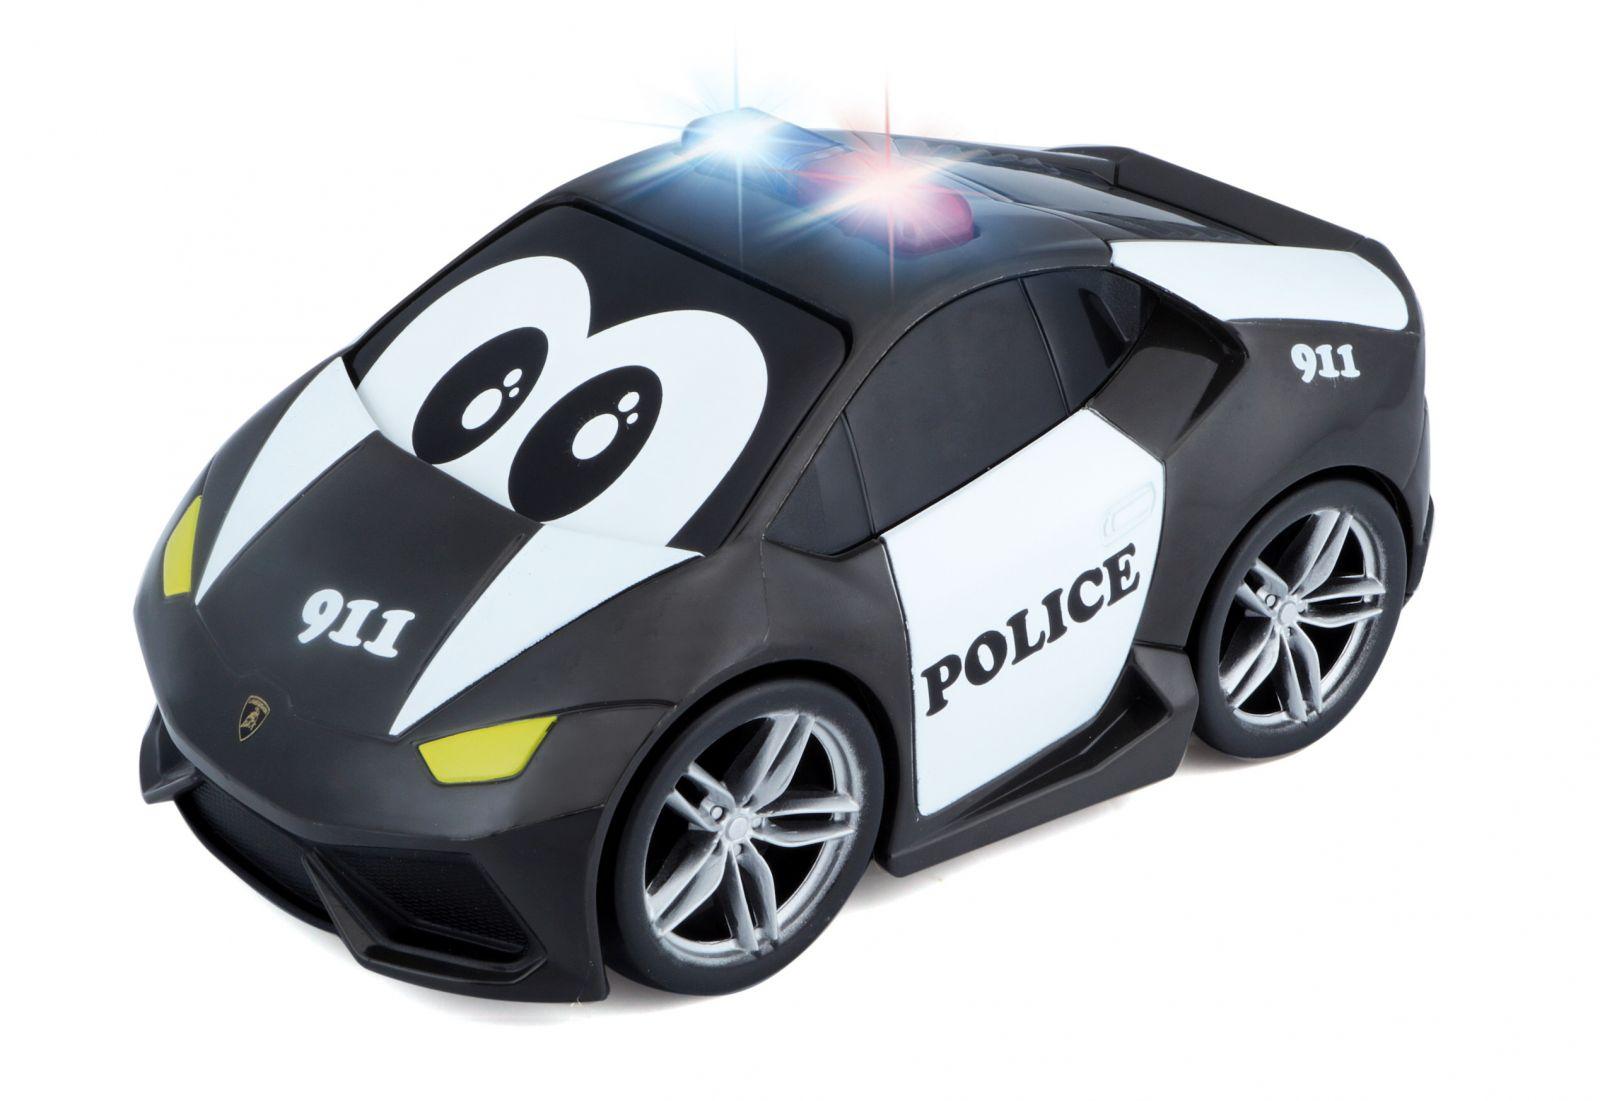 Bburago - autíčko Lamborghini Huracan se zvukem a světlem 13 cm - černé